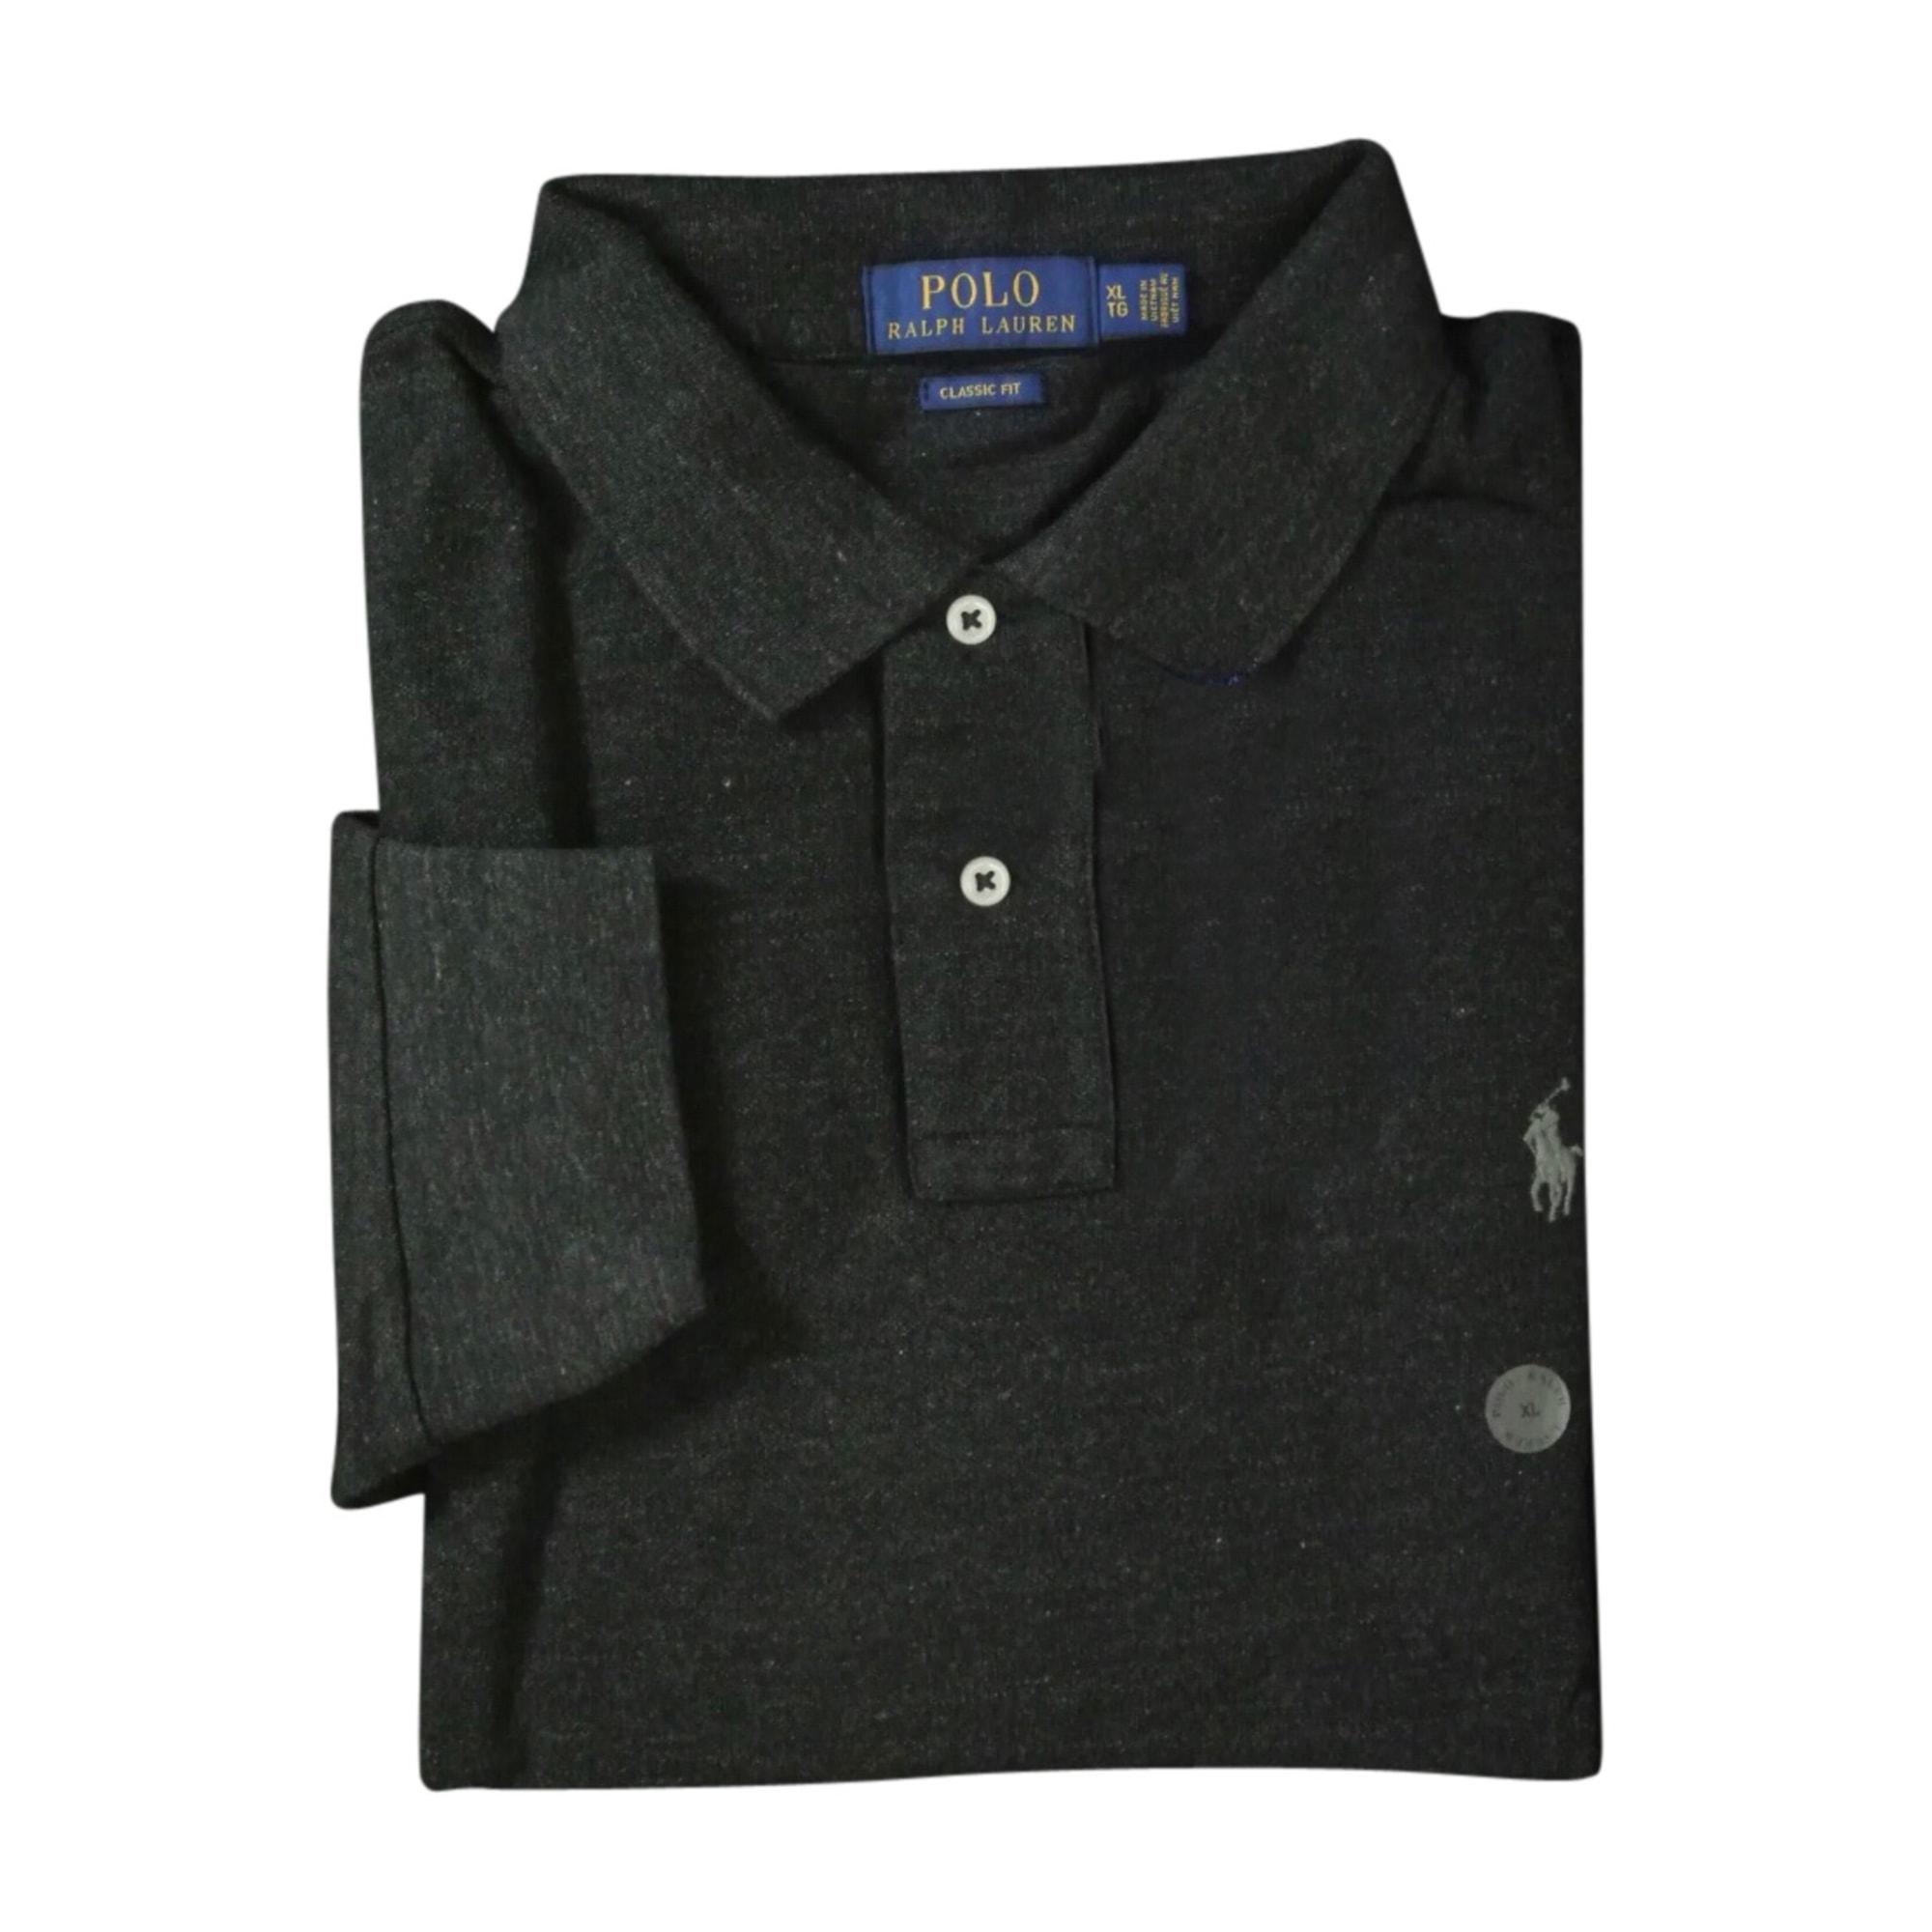 Polo RALPH LAUREN 4 (XL) noir vendu par Croque miss - 8273834 f0e81e2b88ee